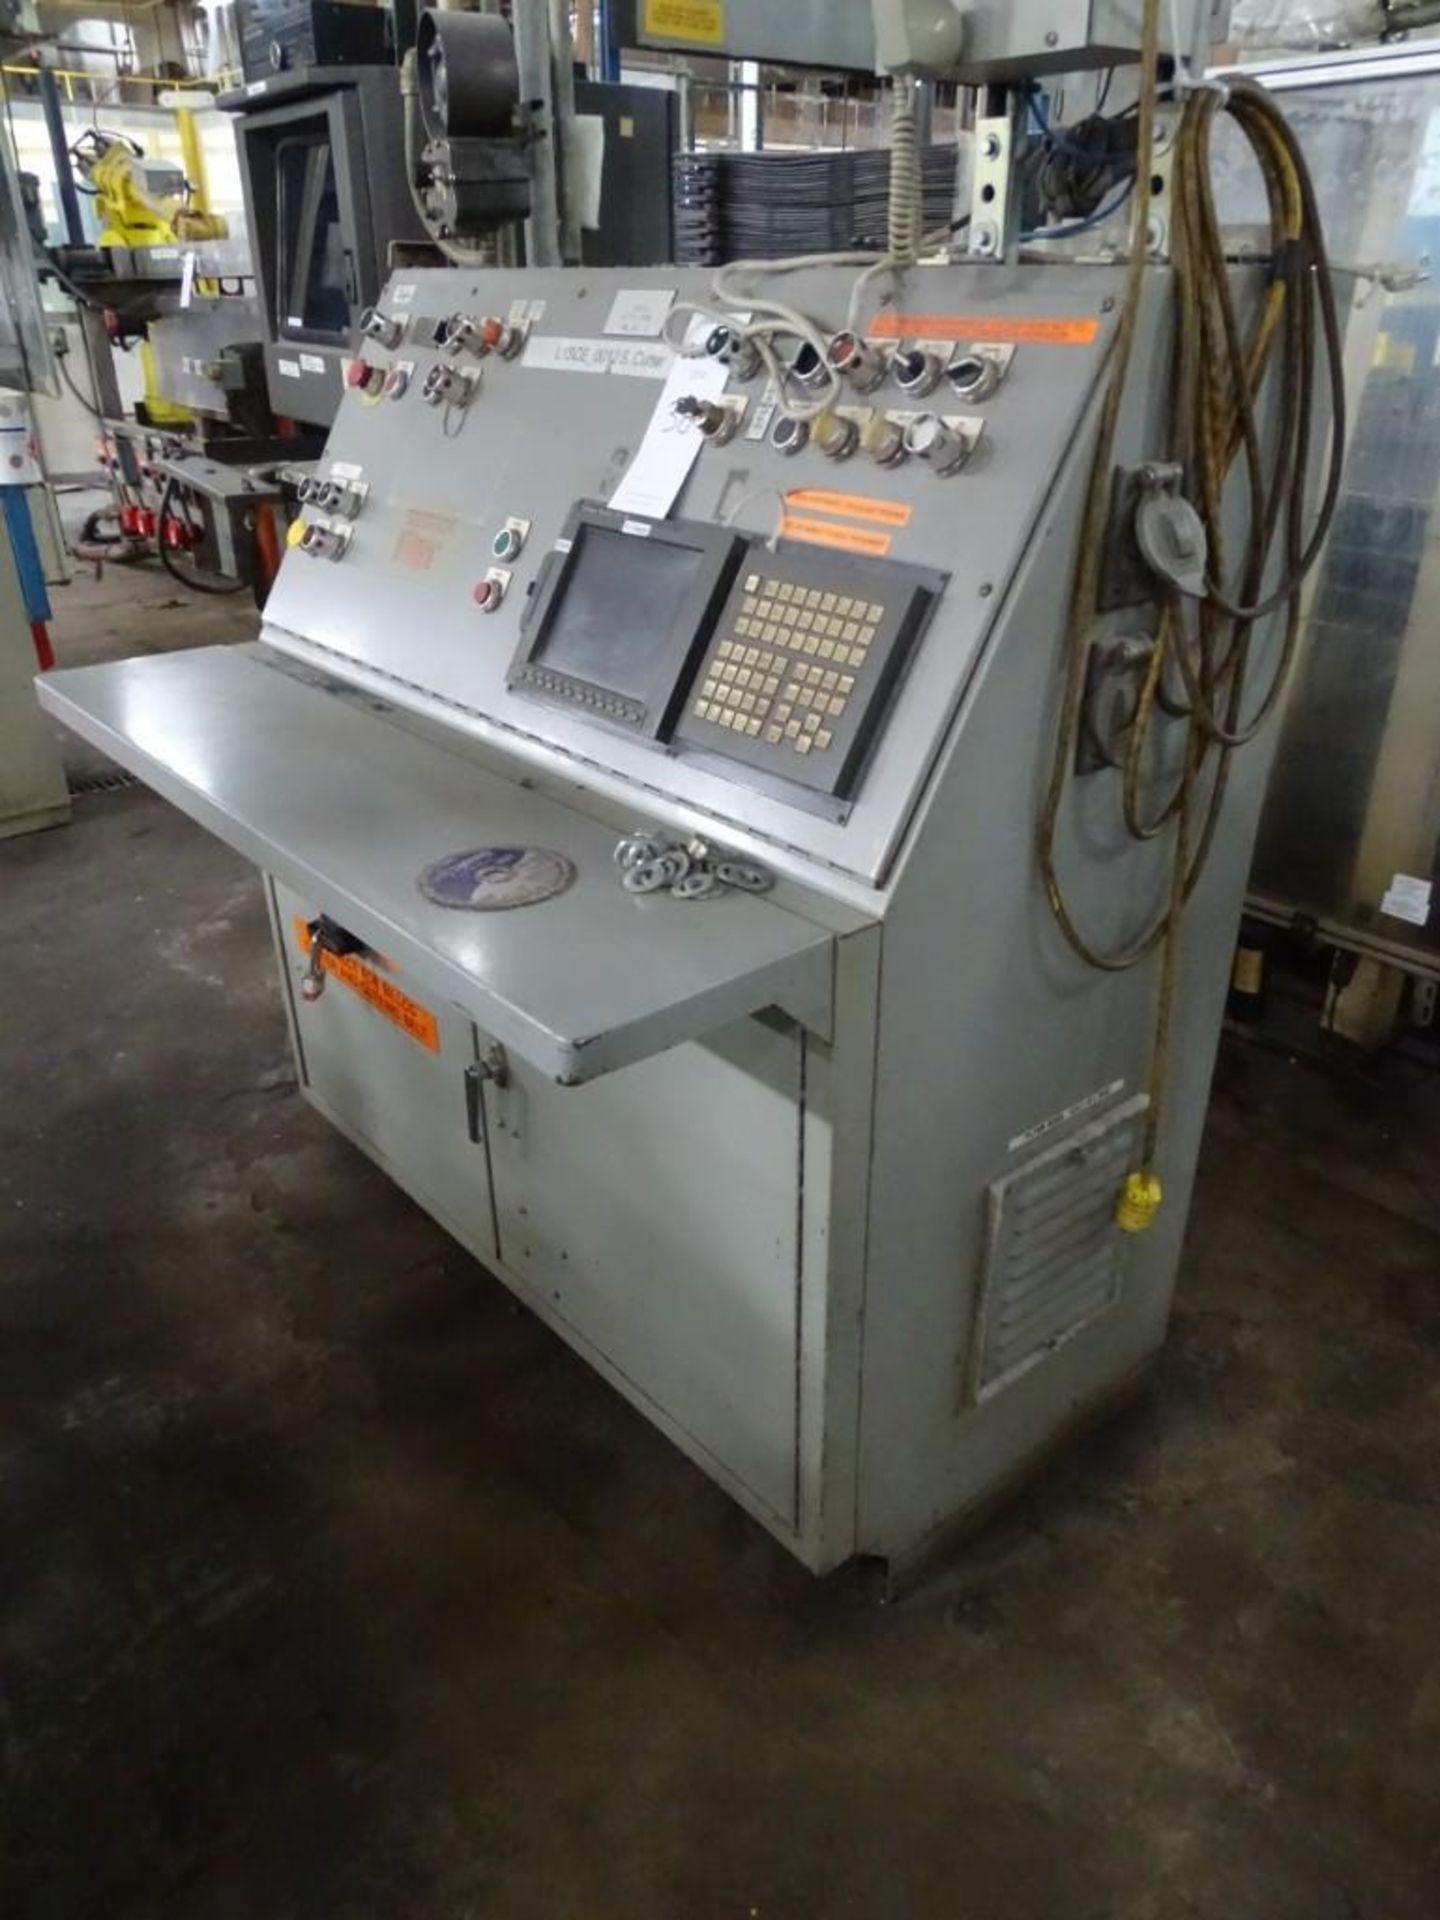 Billco Glass Cutting Conveyor System - Image 11 of 11